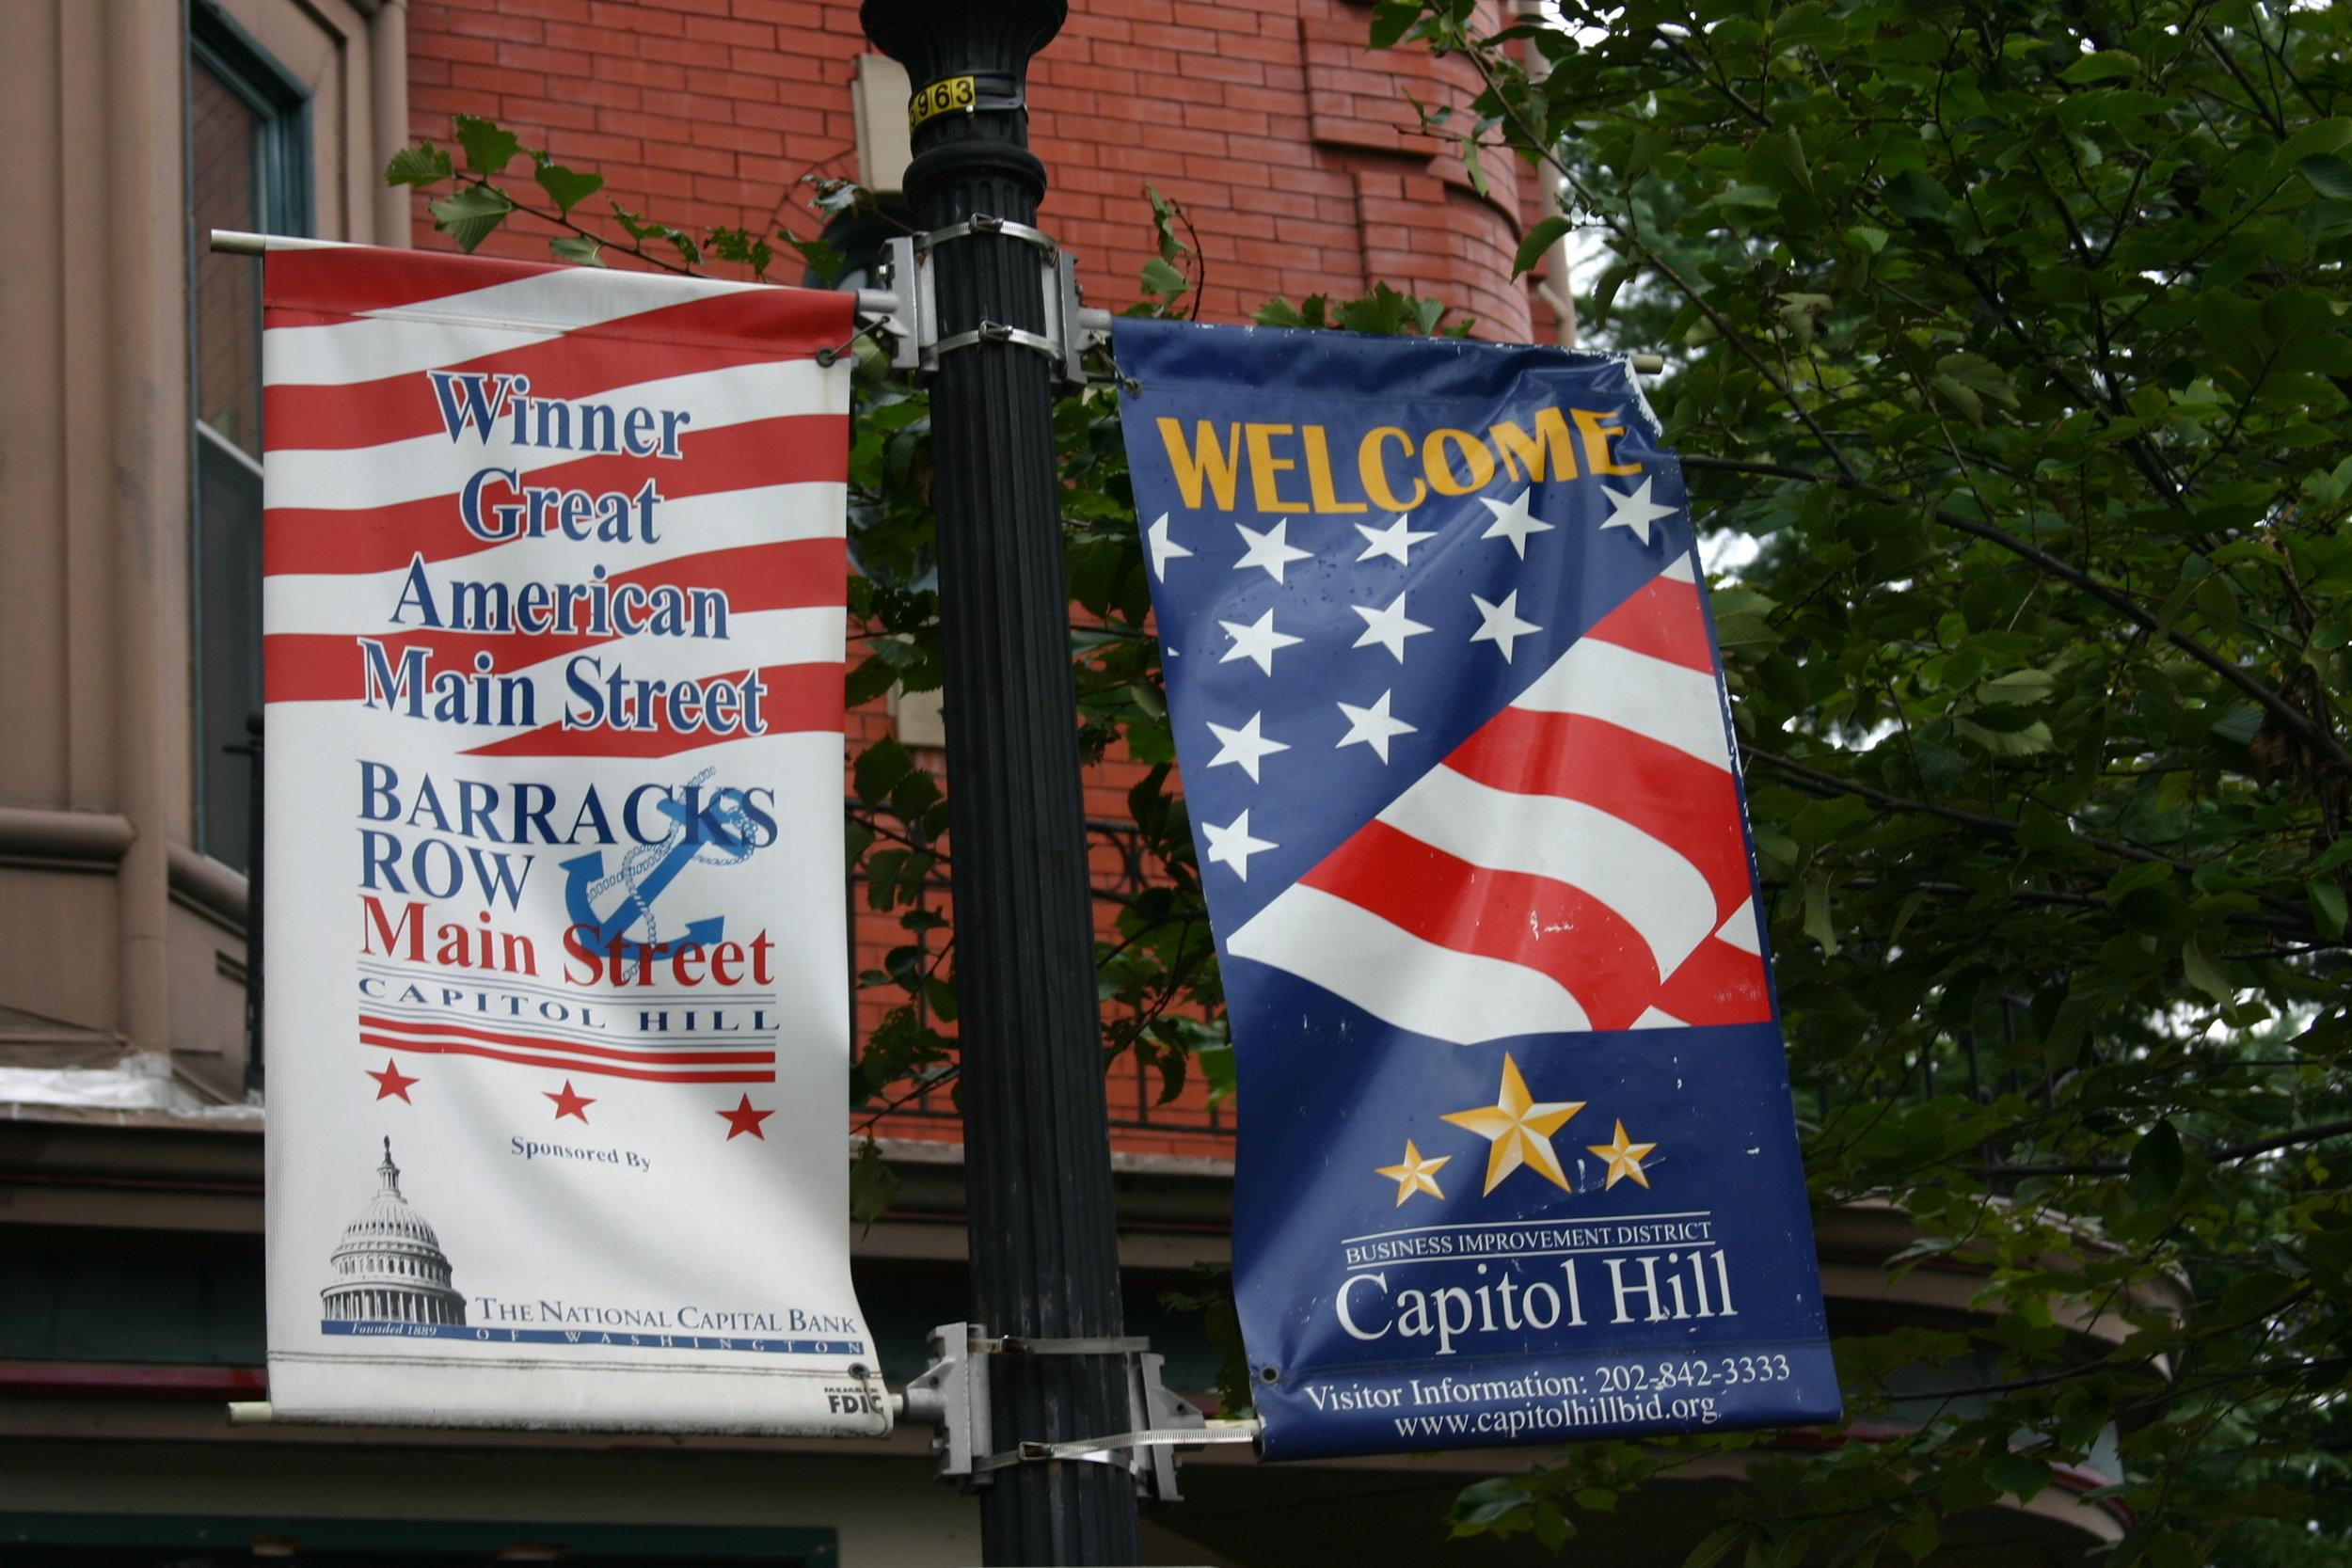 Barracks Row, Capitol Hill, Washington, DC, Fall 2011